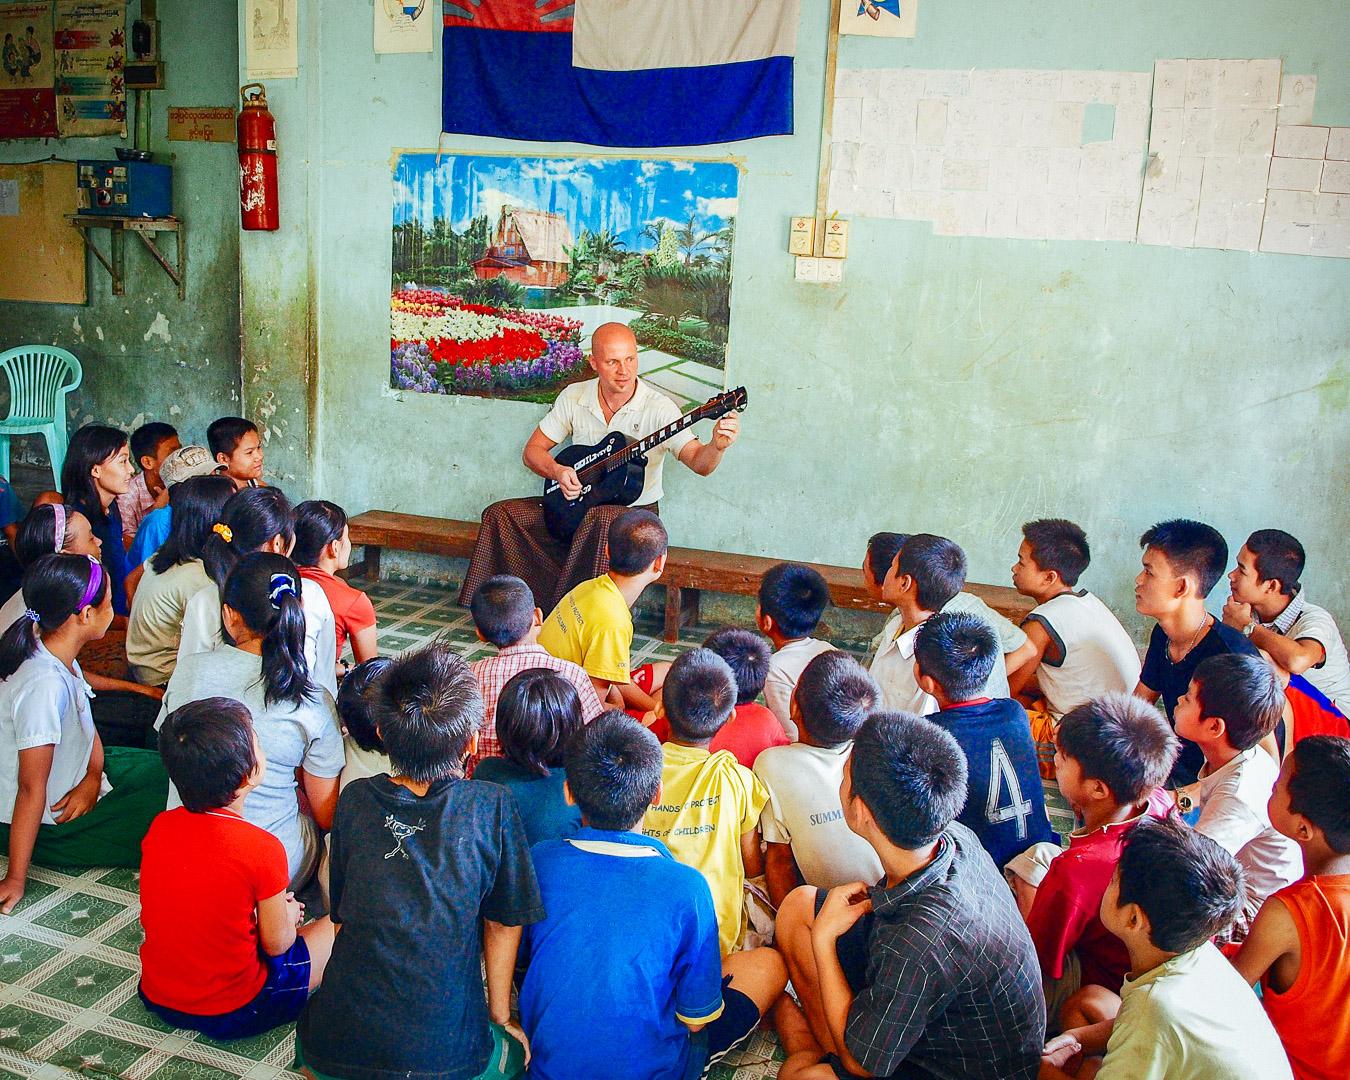 Orphanage in Yangon, Myanmar